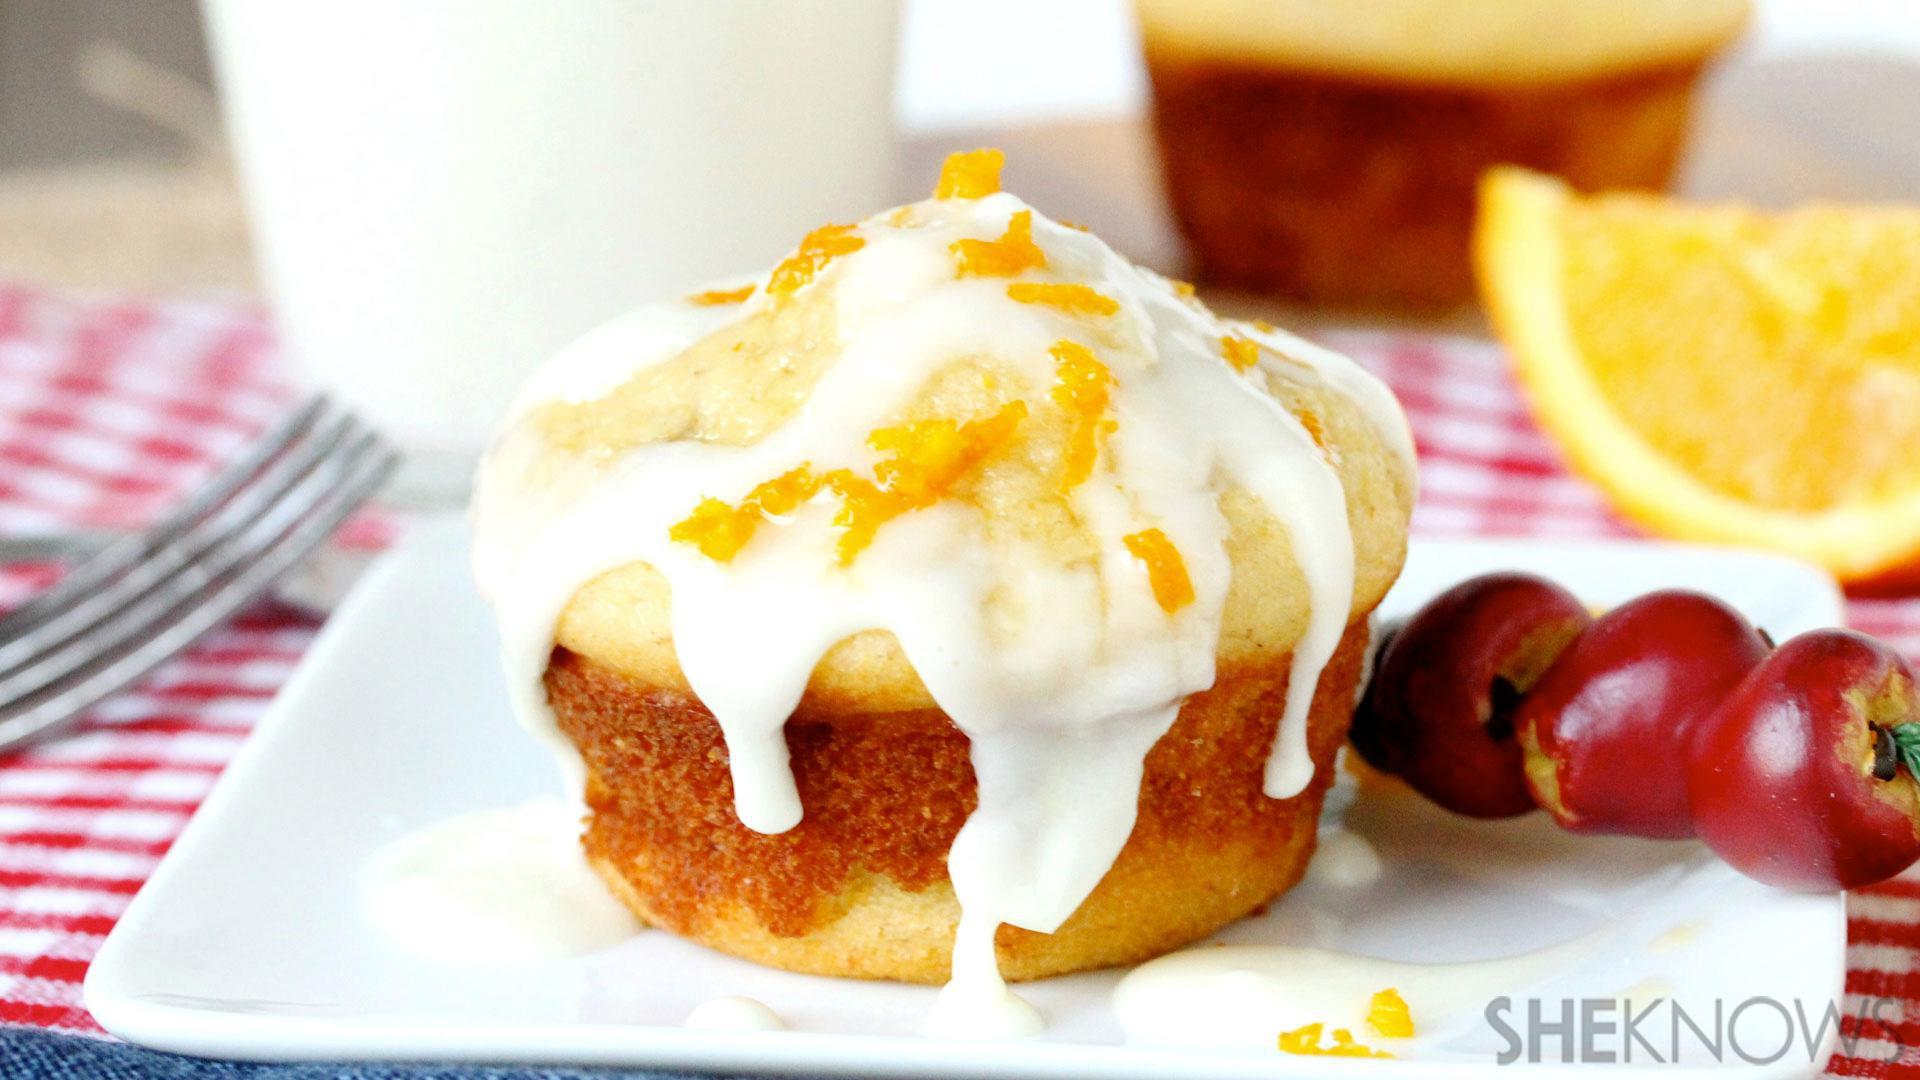 Banana cornbread muffins are your breakfast-dessert obsession